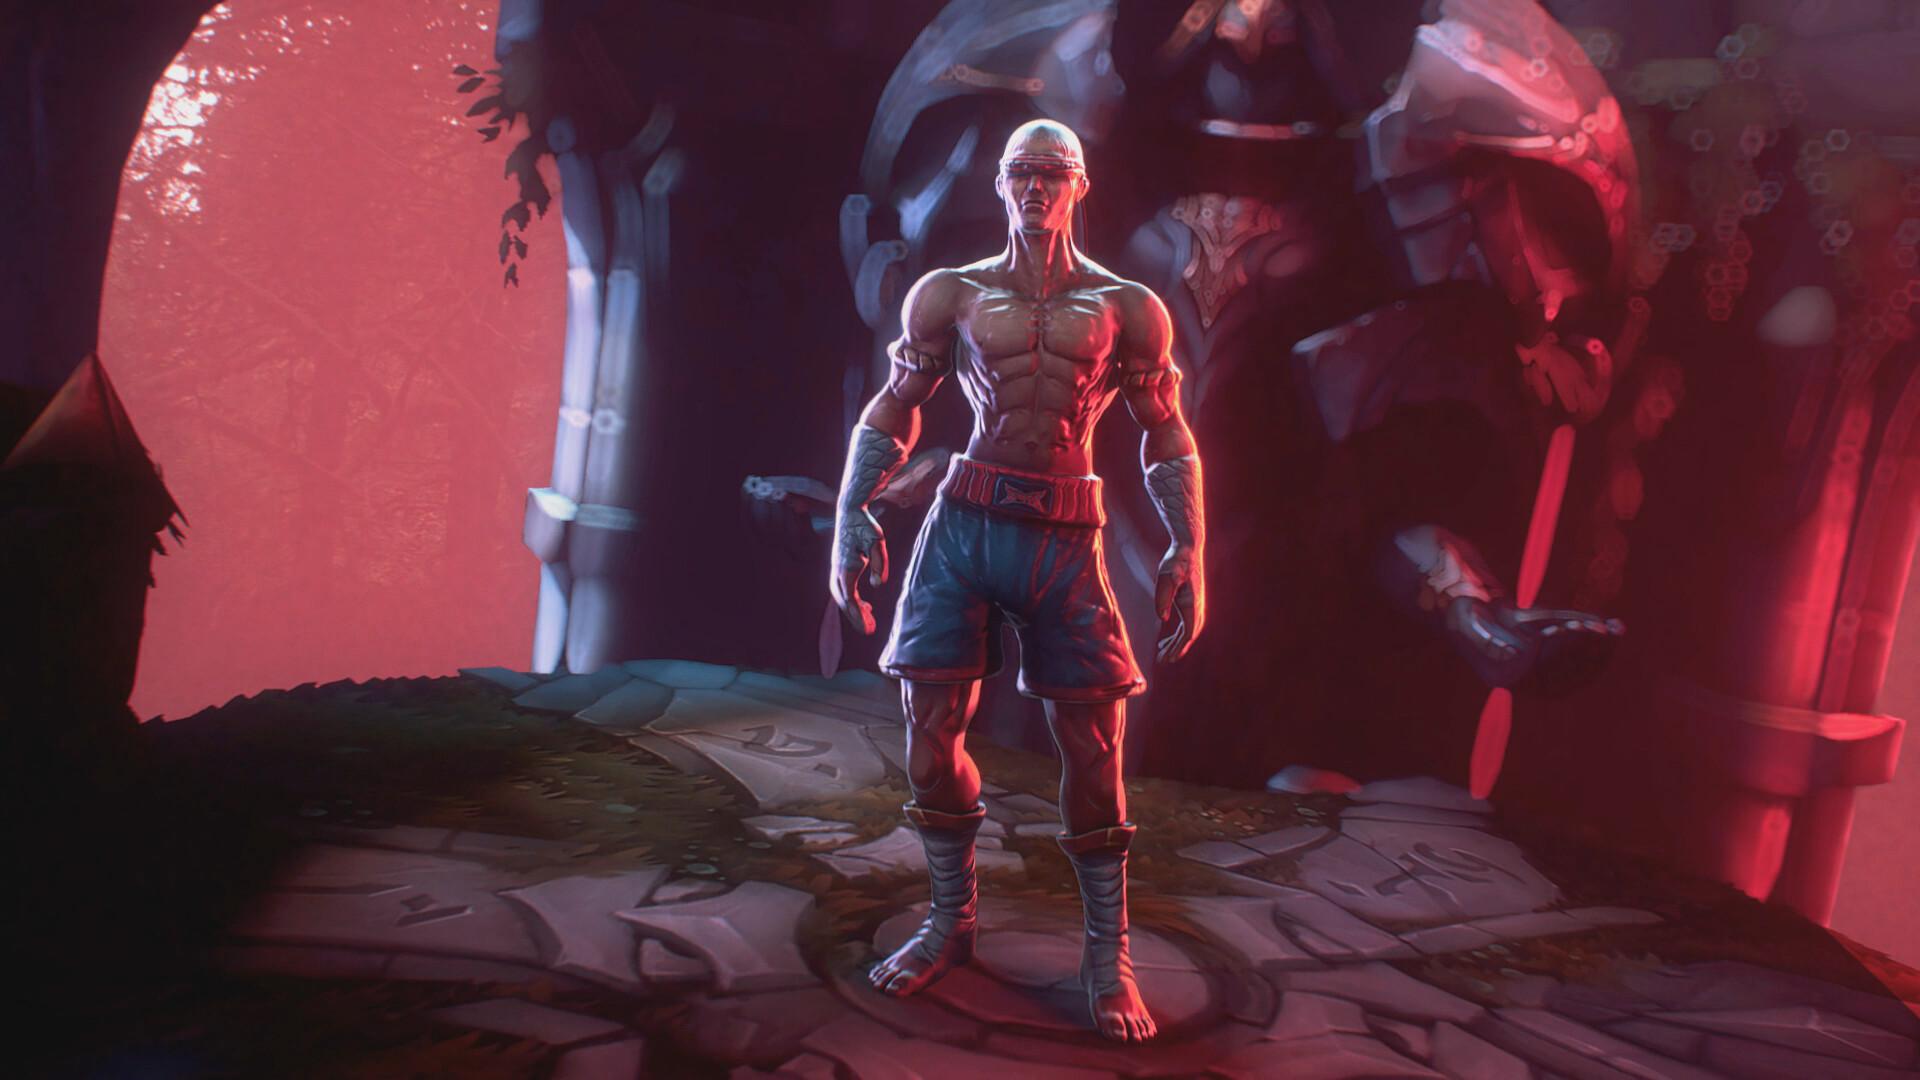 Brahim Touhami Lee Sin League Of Legends Octane Render